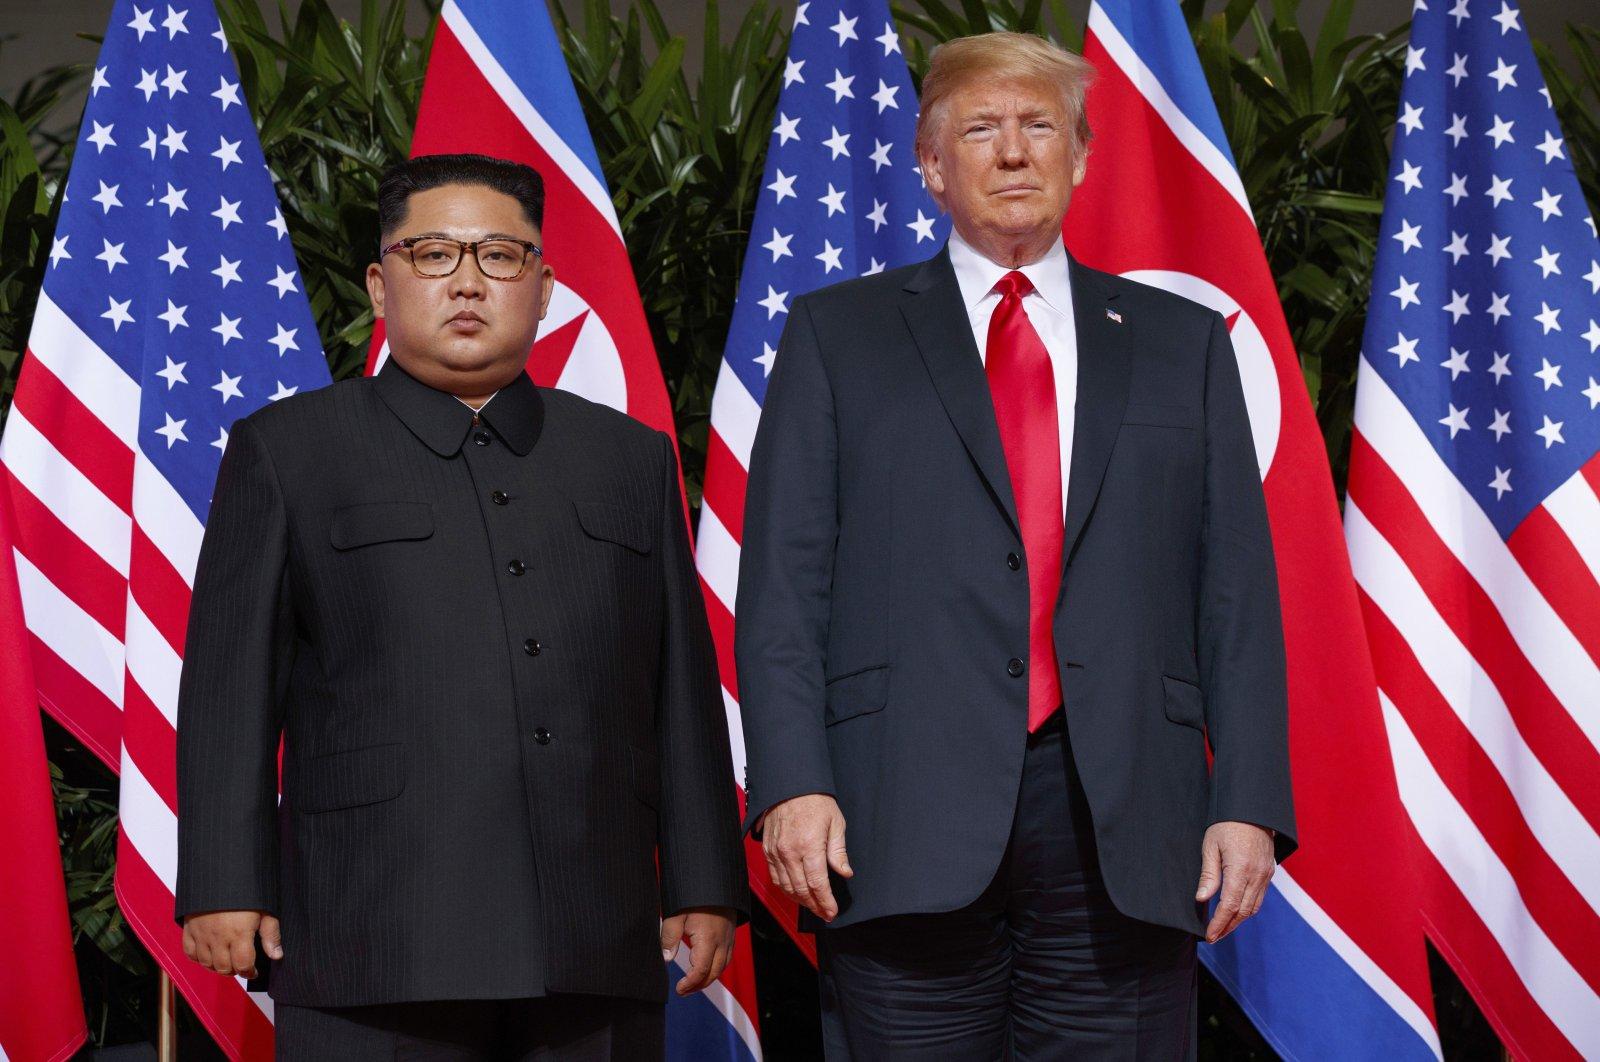 U.S. President Donald Trump meets with North Korean leader Kim Jong Un on Sentosa Island, Singapore, June 12, 2020. (AP Photo)